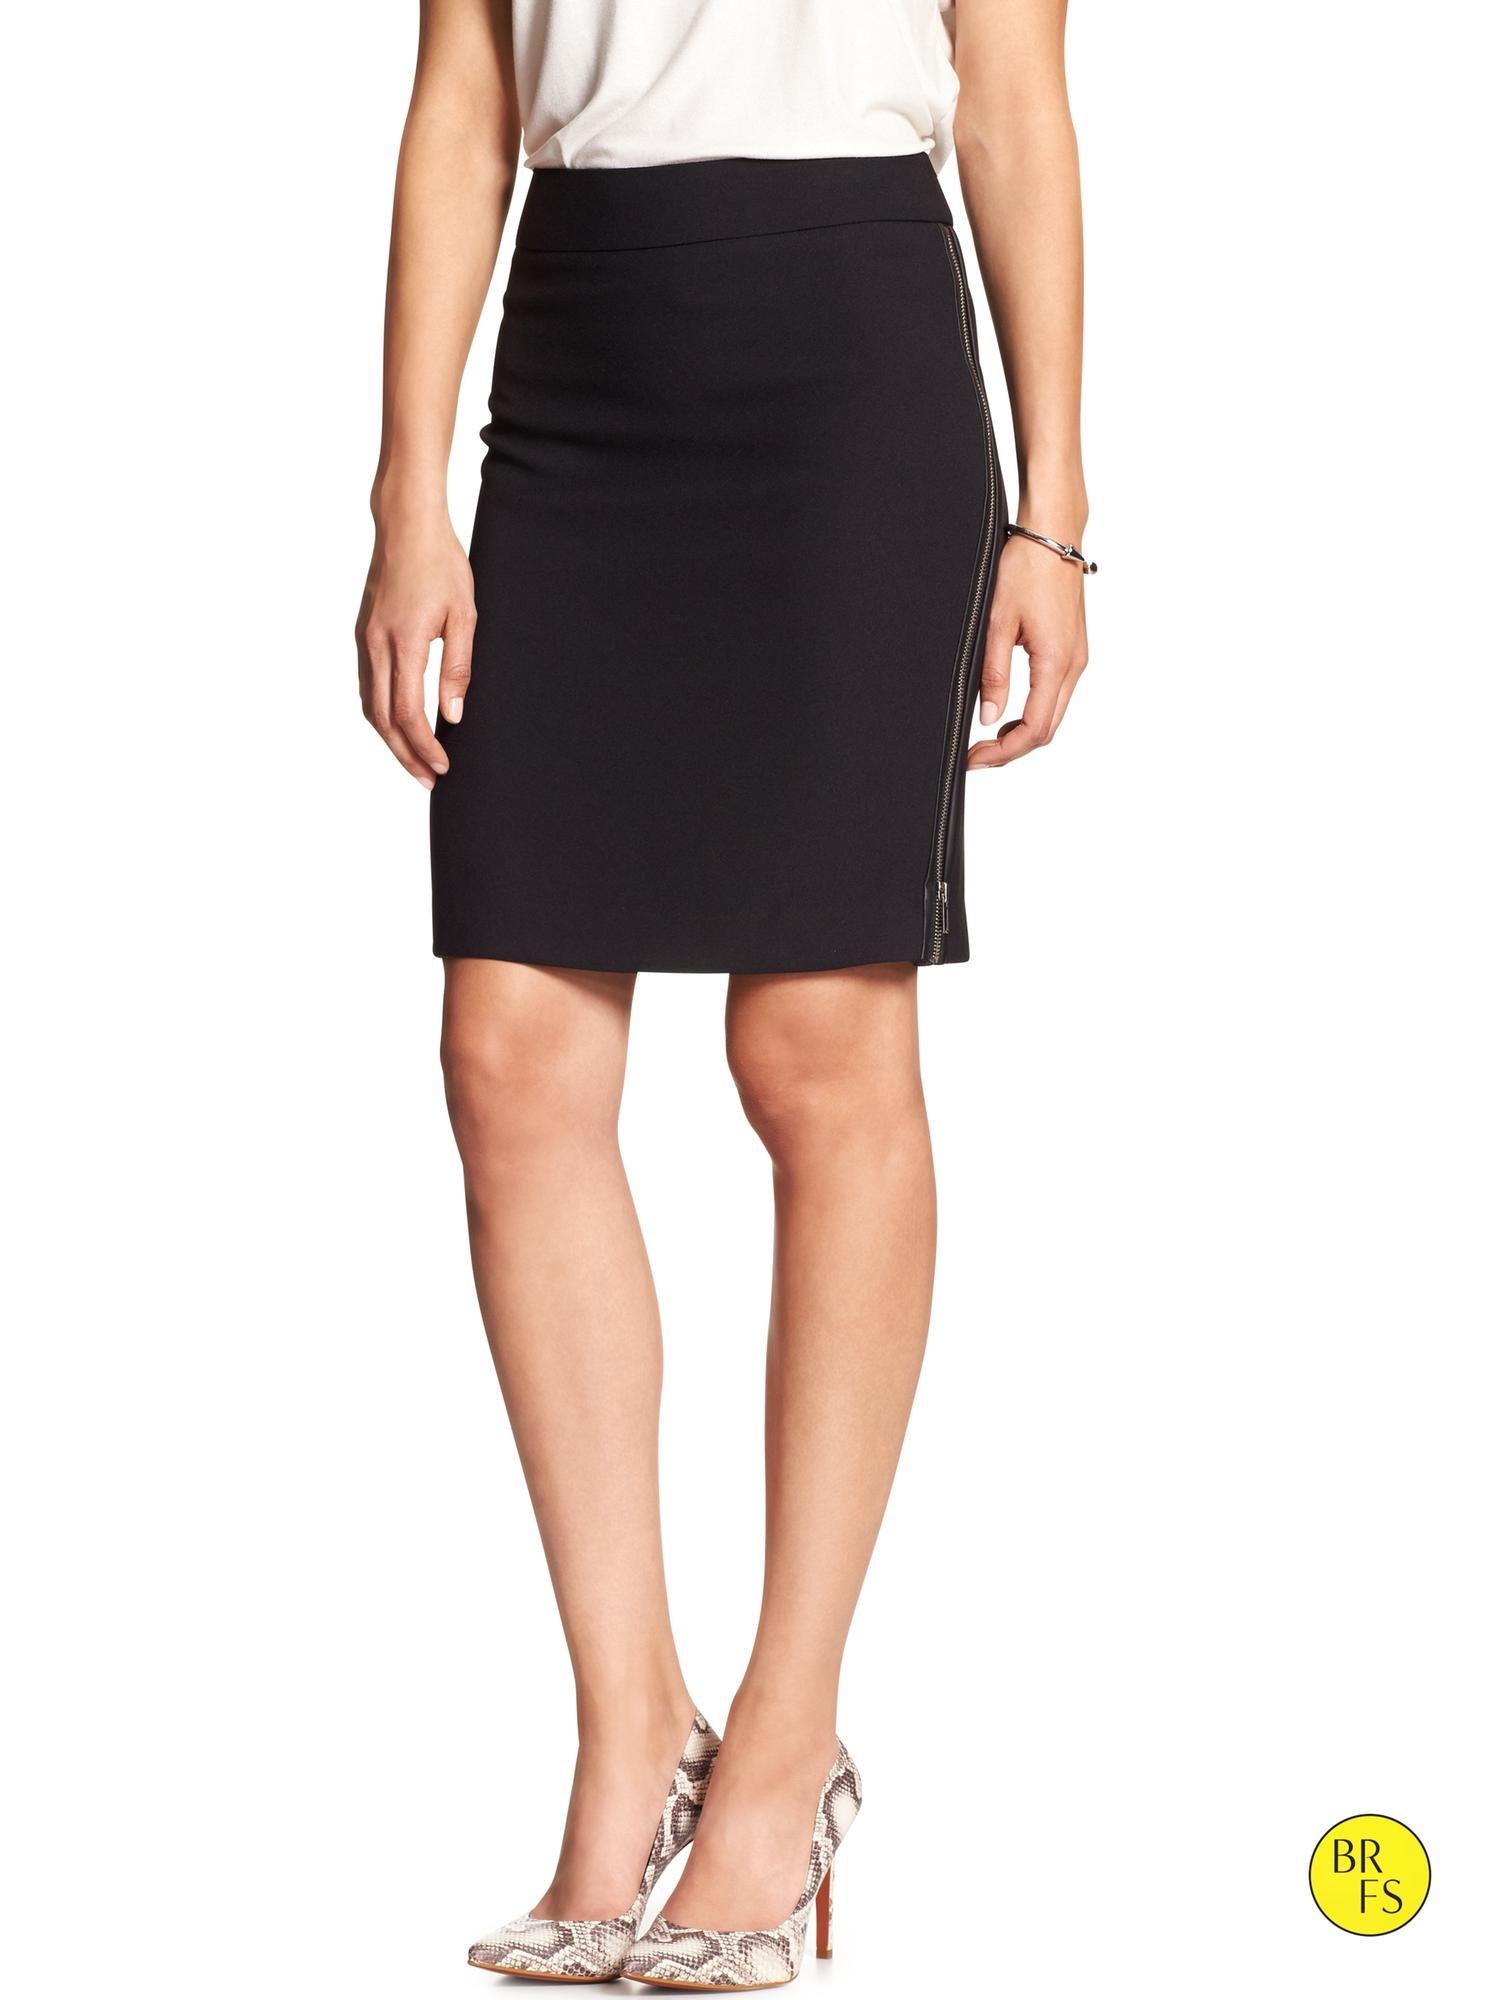 d24ed417f0 Banana Republic Factory Side-Zip Pencil Skirt in Black - Lyst